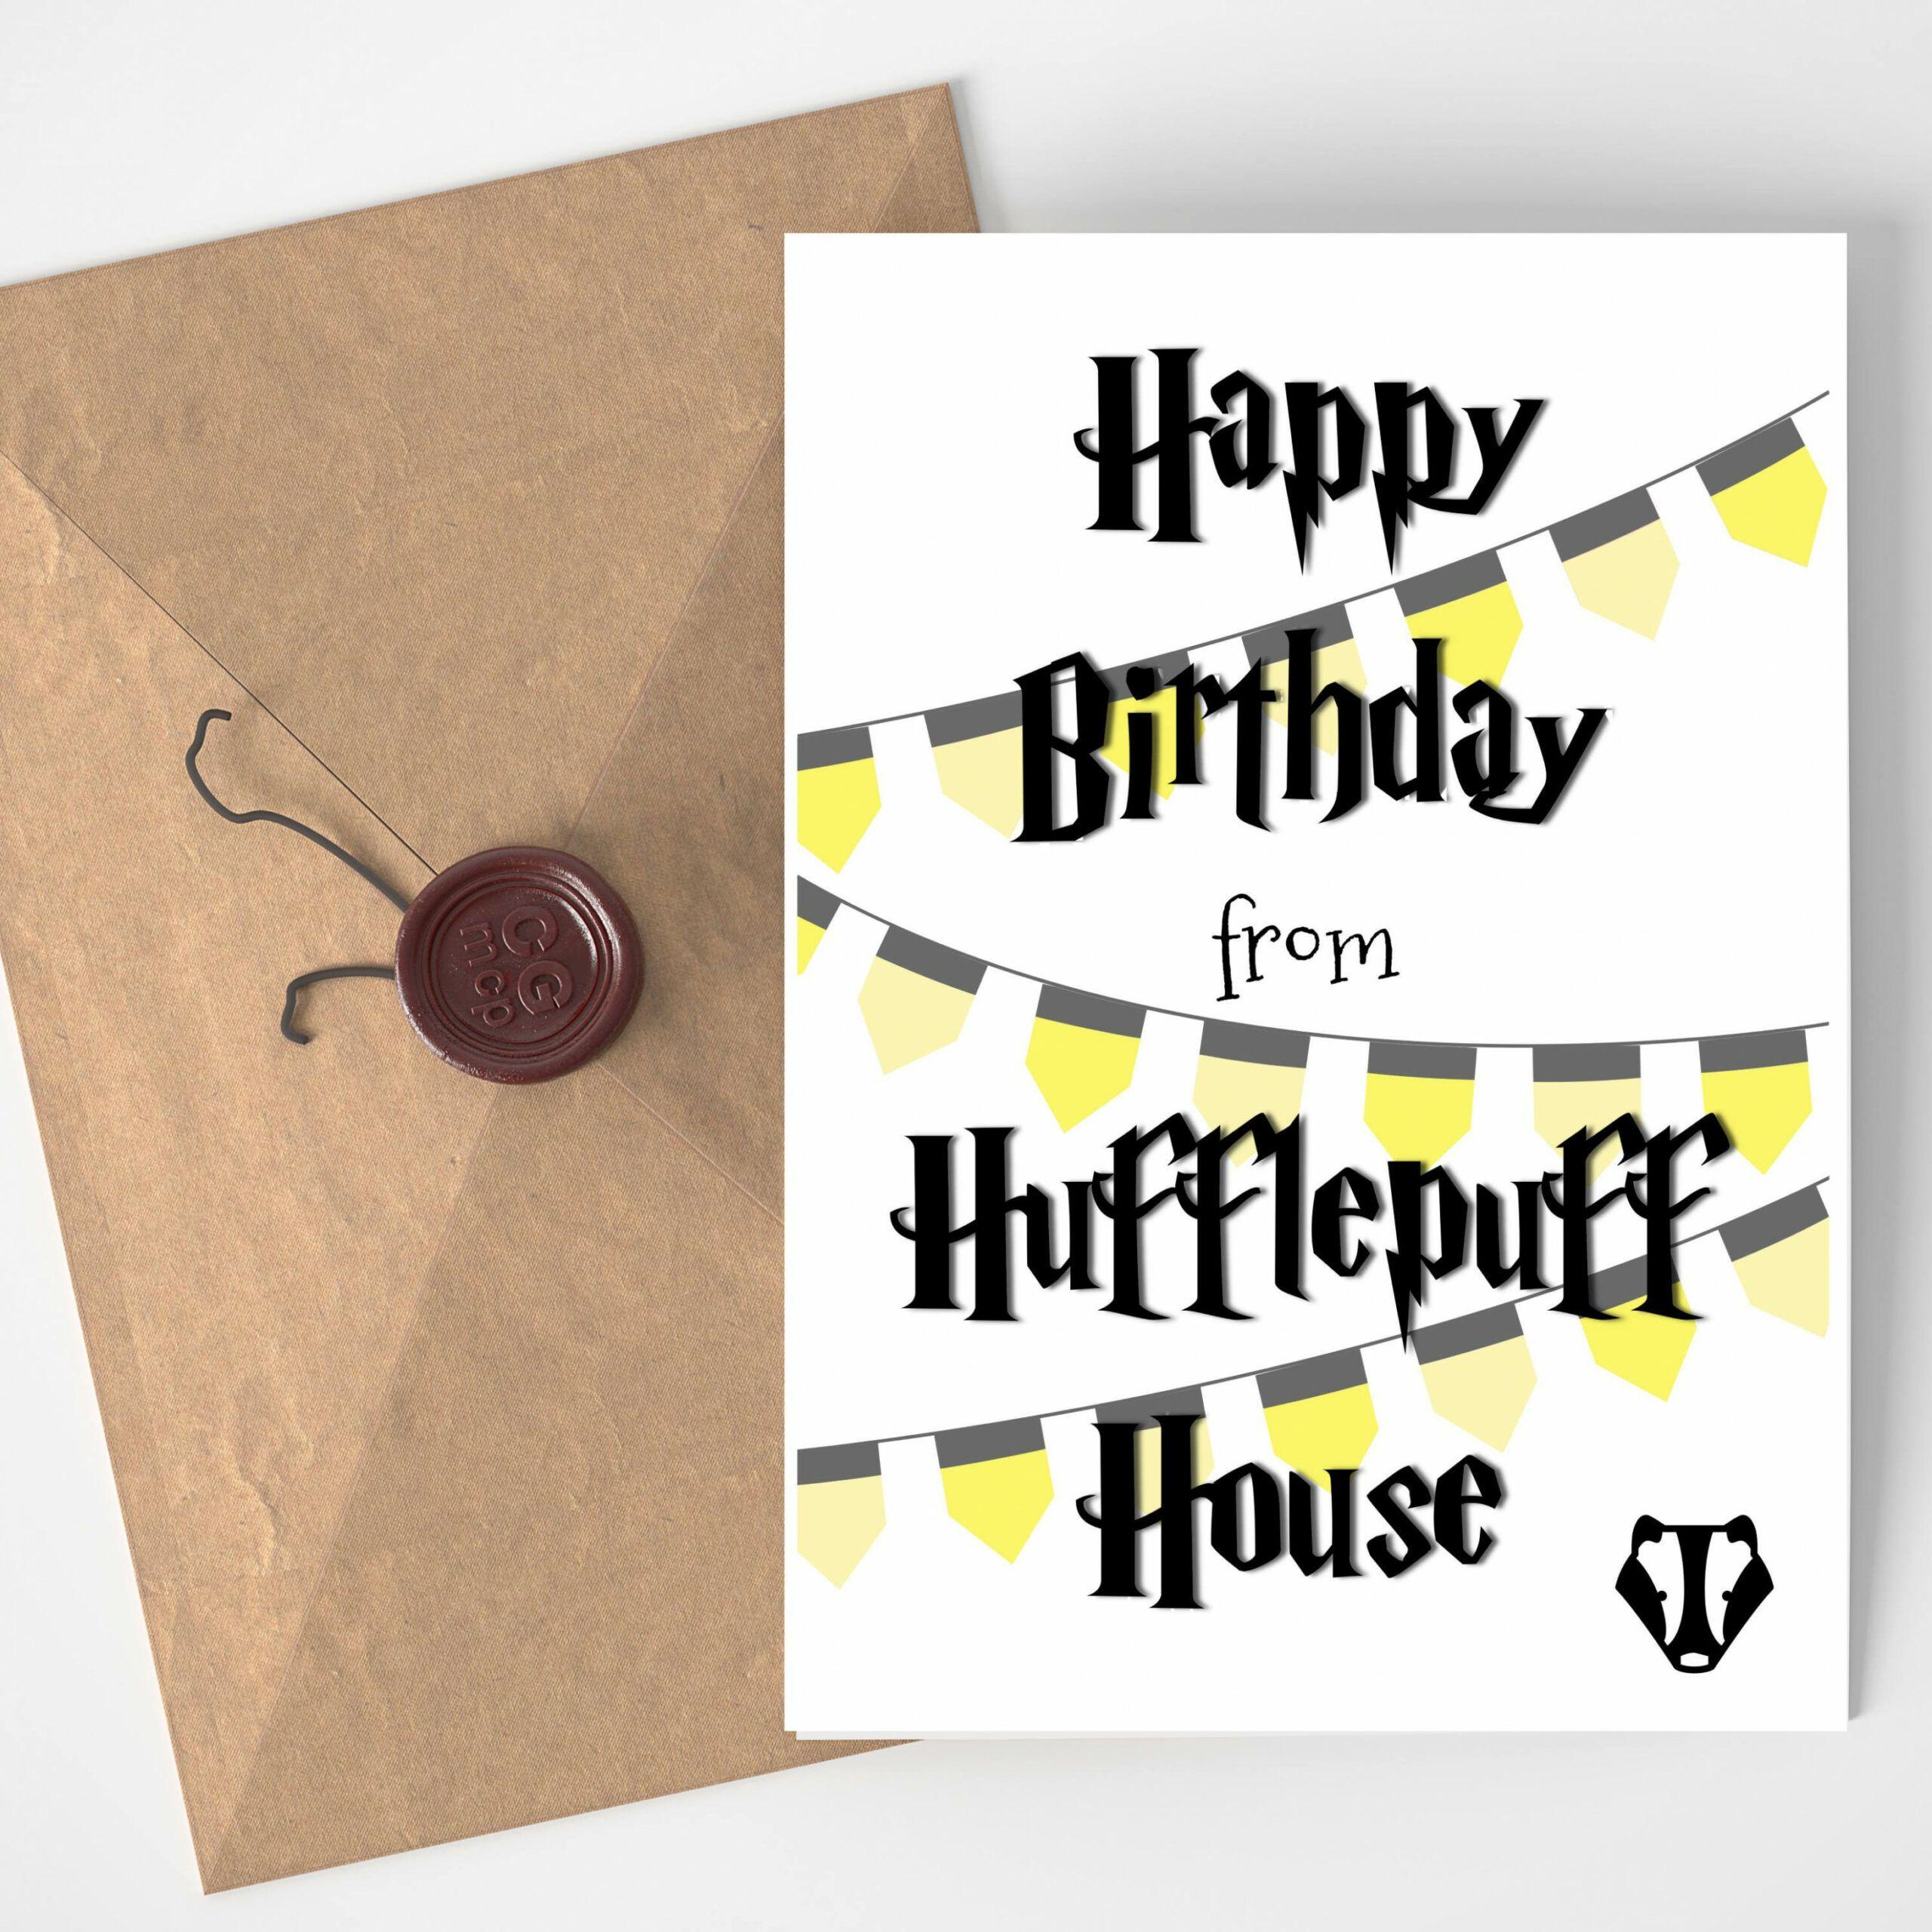 11 Best Diy Harry Potter Birthday Card Amazon promised ...